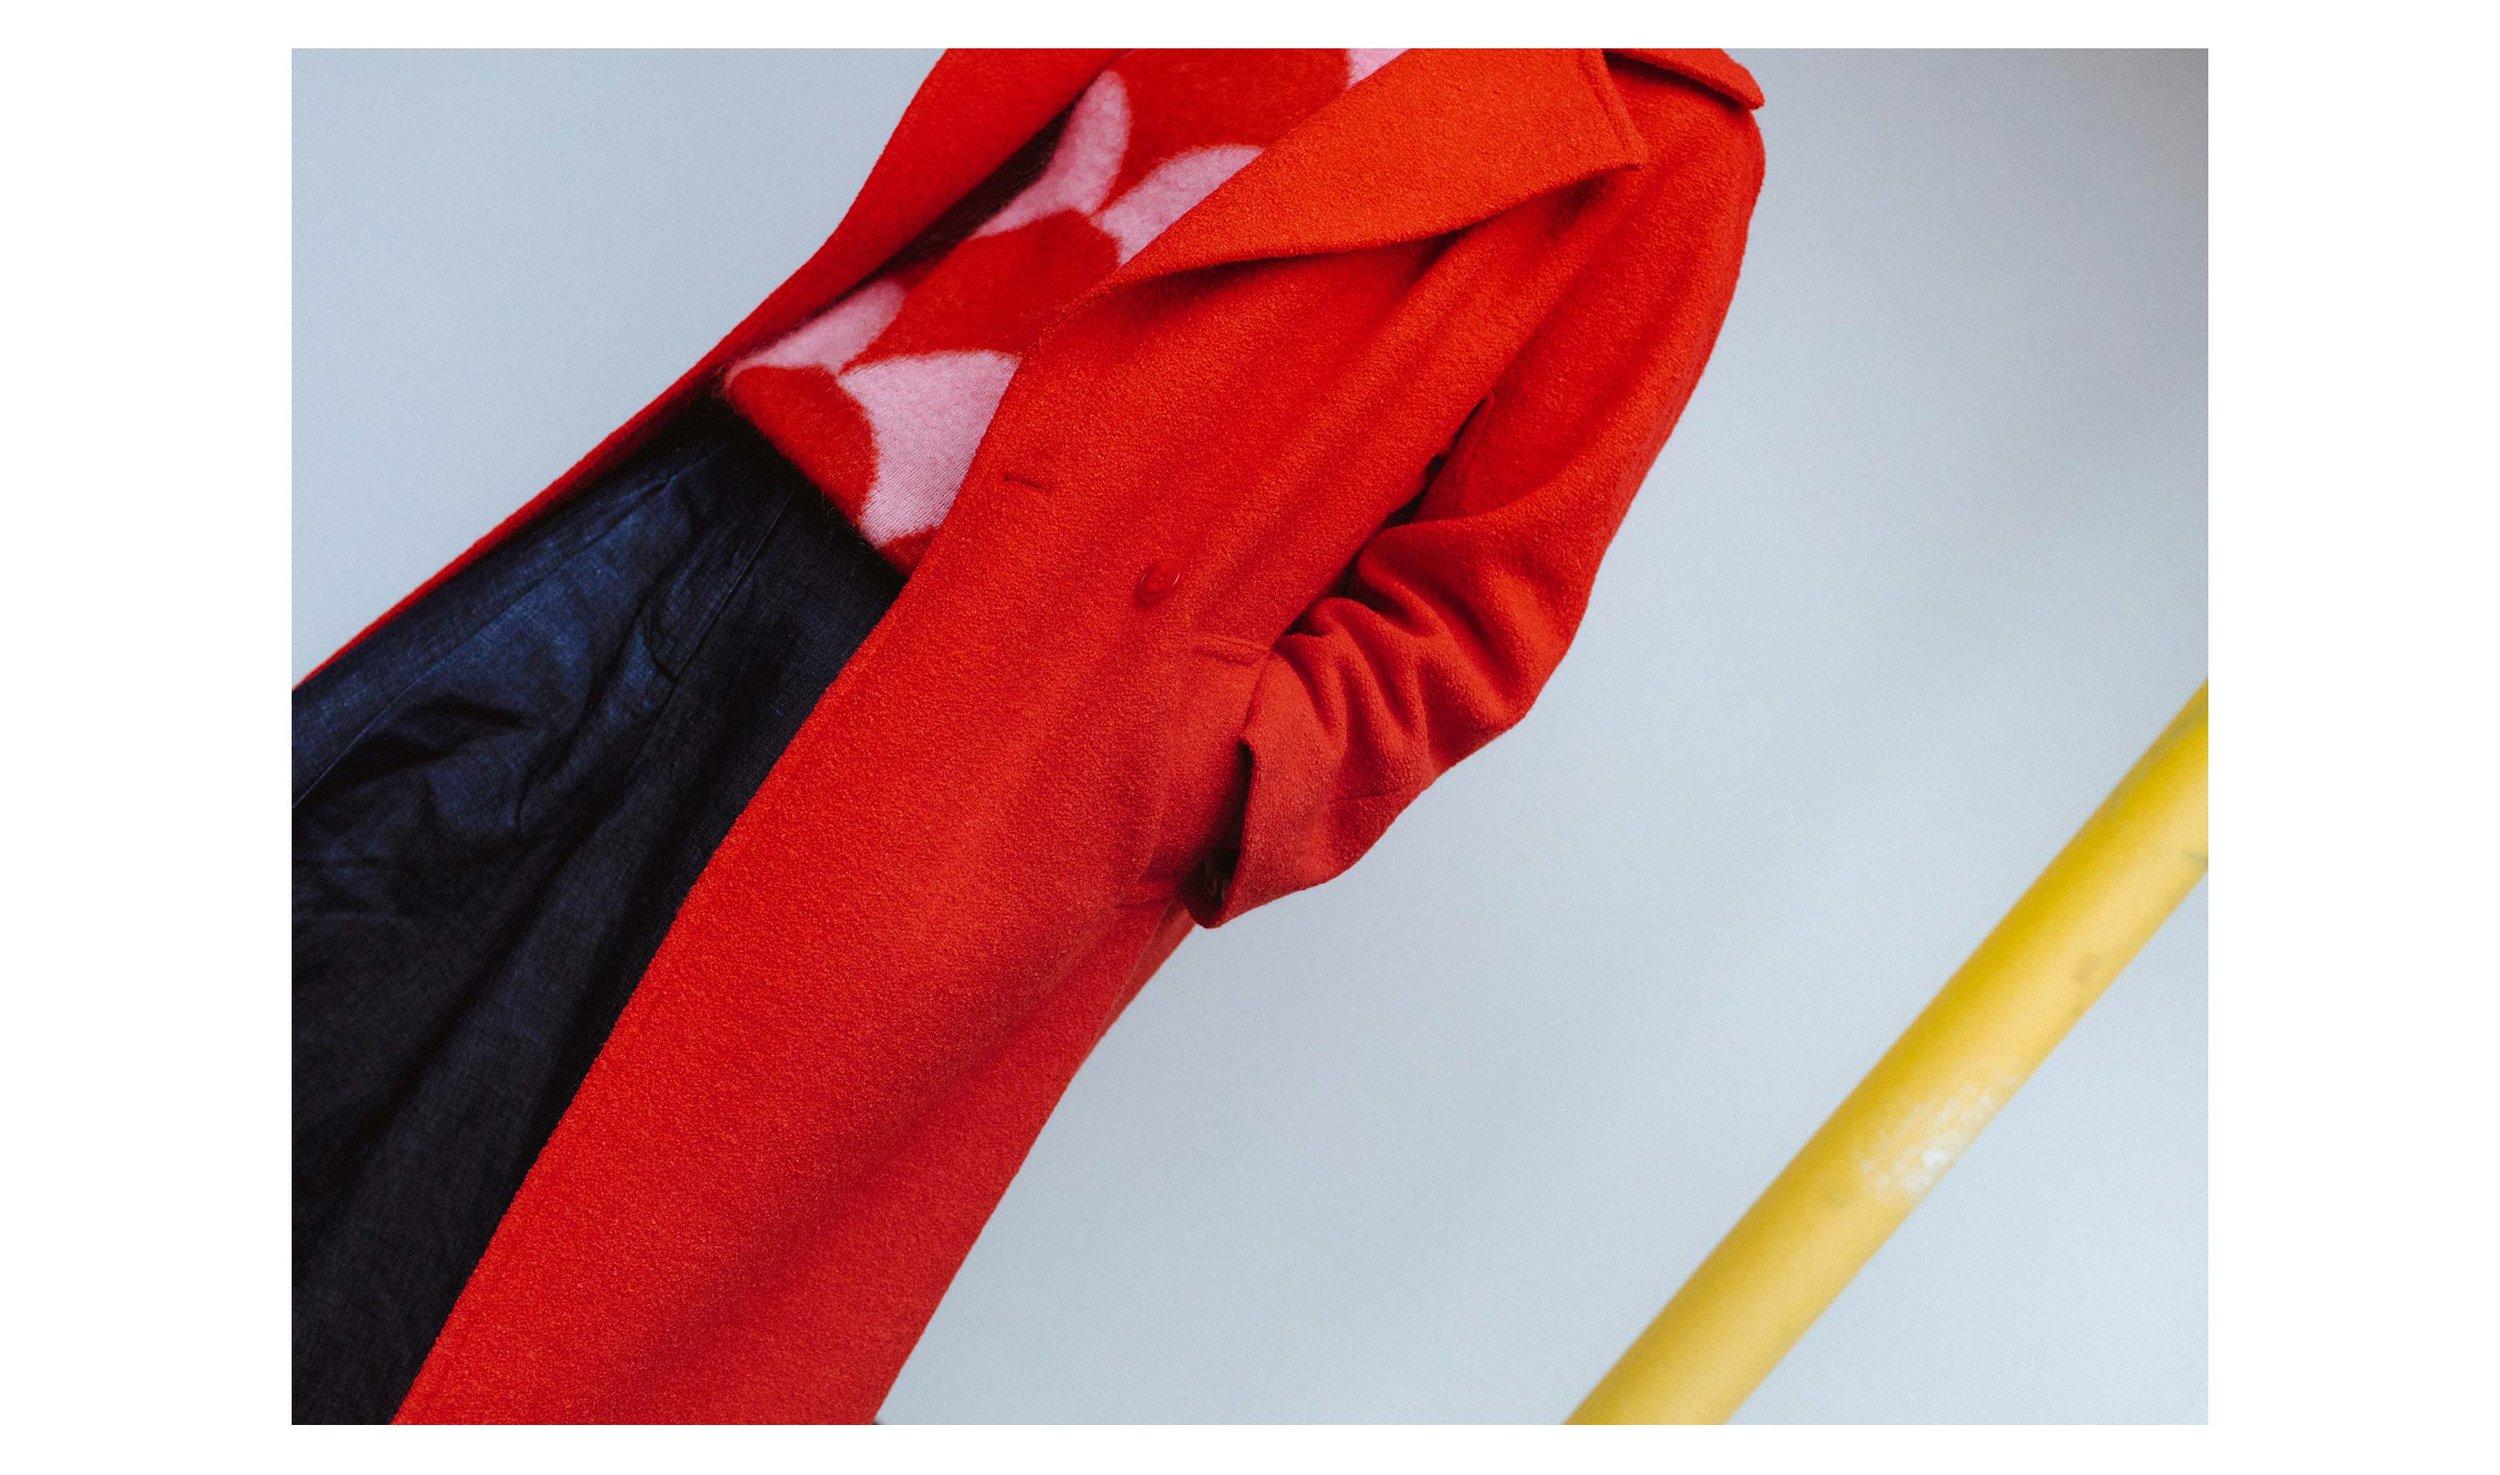 Red-coat-28.jpg